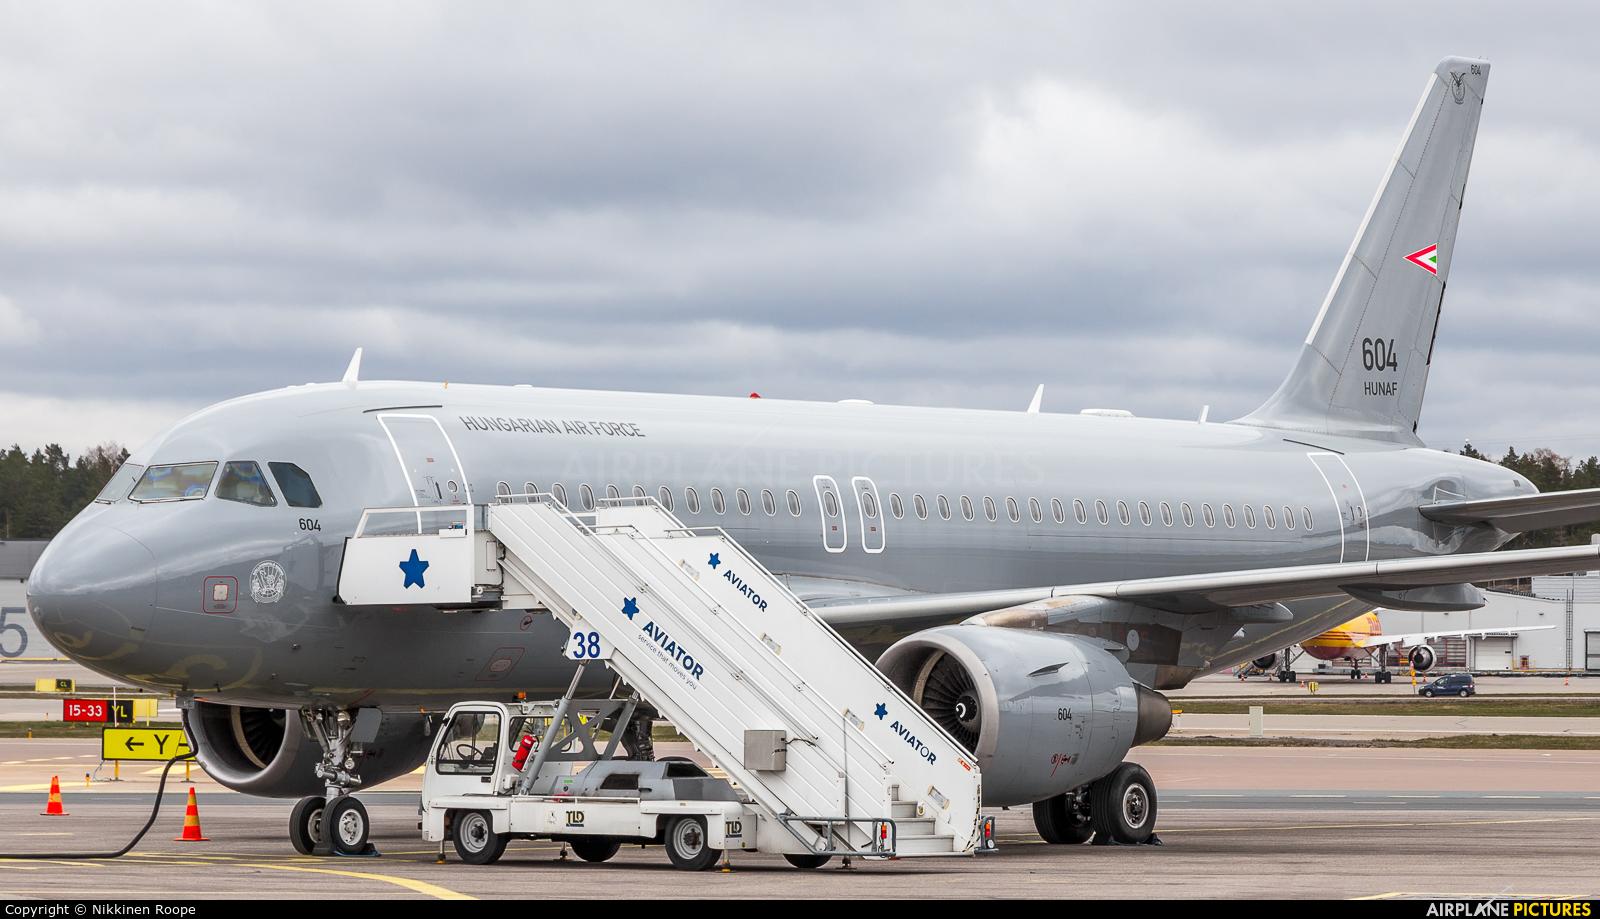 Hungary - Air Force 604 aircraft at Helsinki - Vantaa